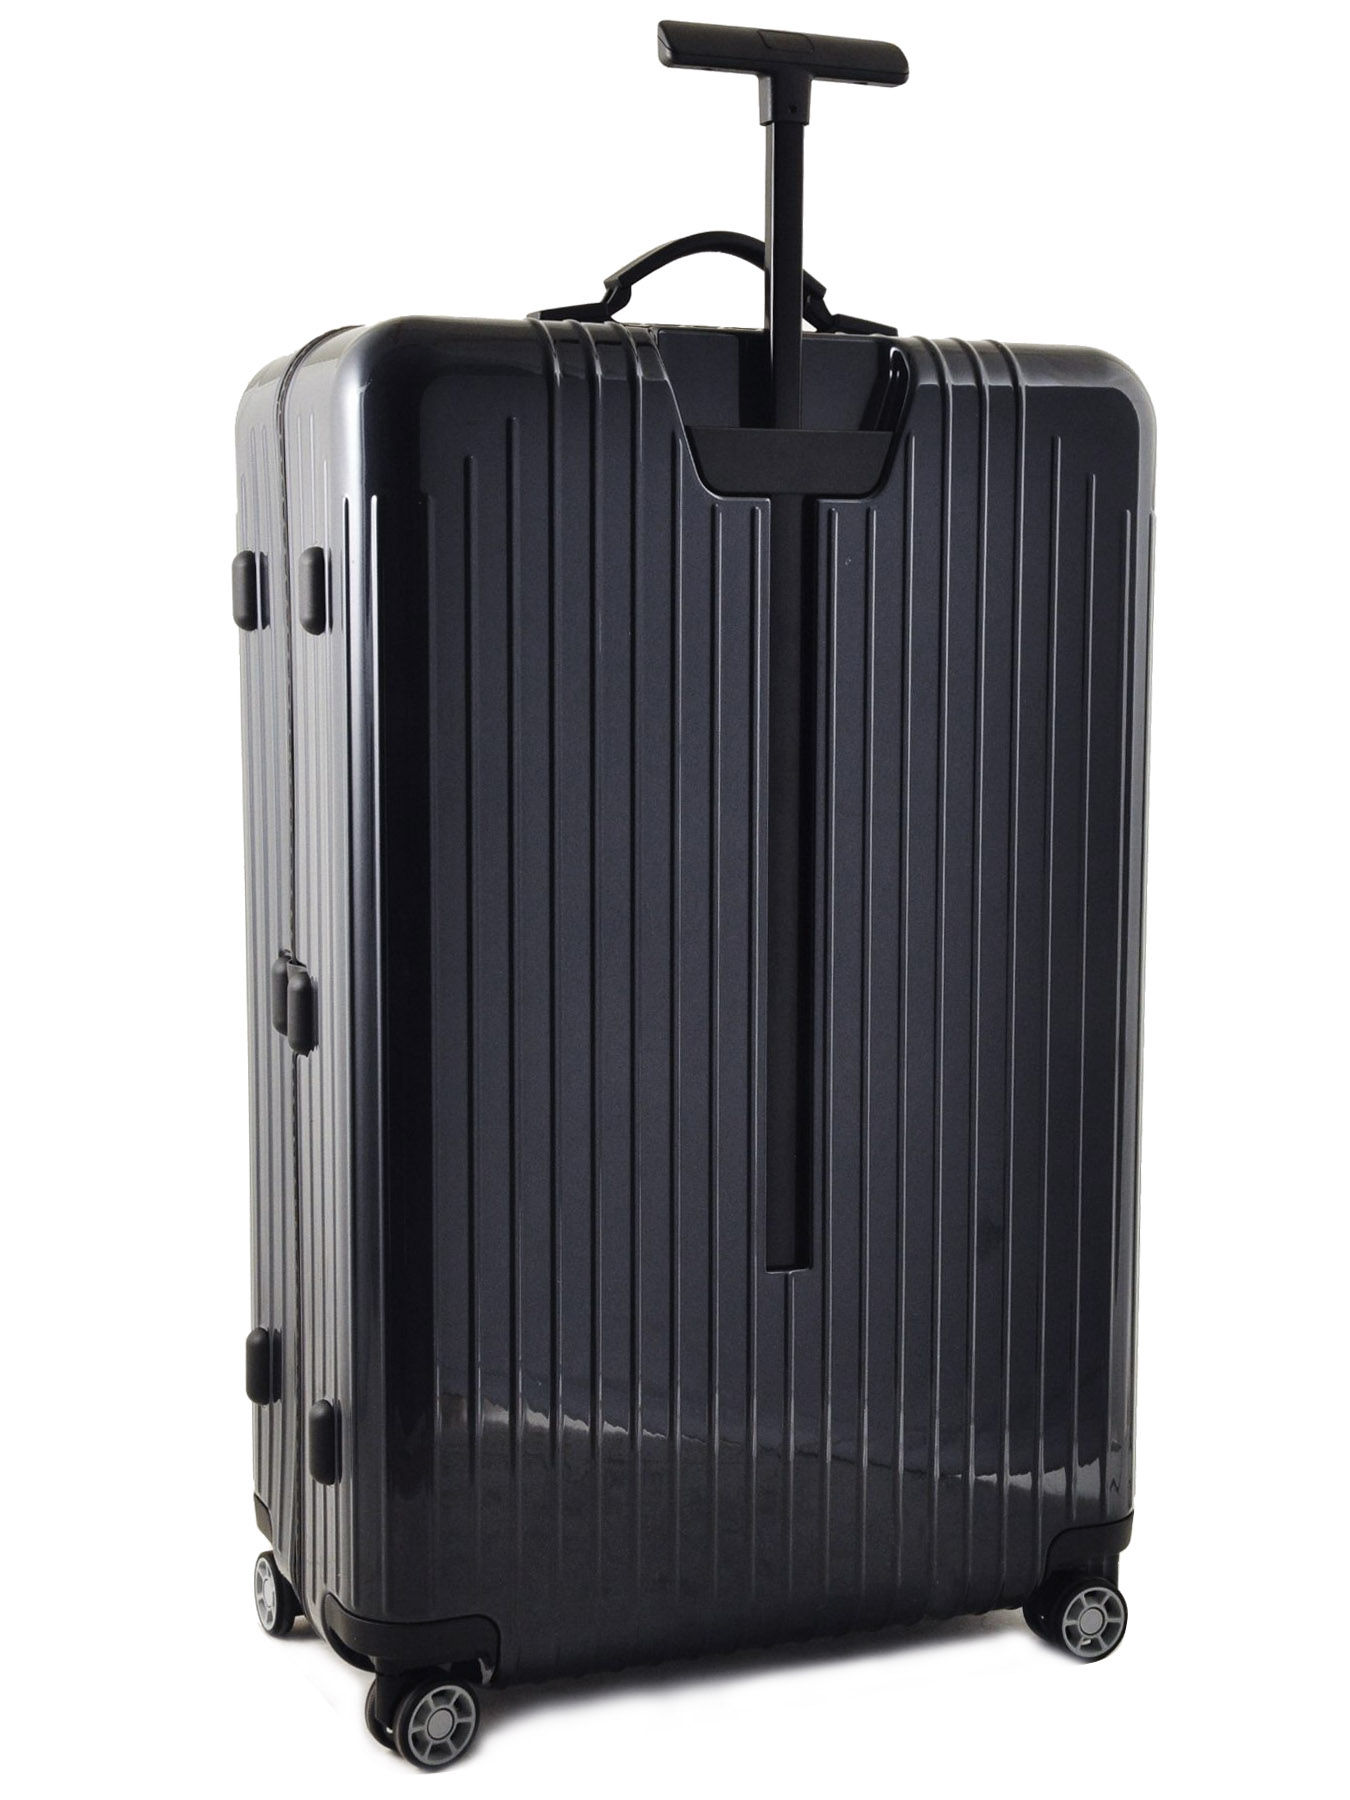 valise rigide rimowa salsa air marine en vente au meilleur prix. Black Bedroom Furniture Sets. Home Design Ideas